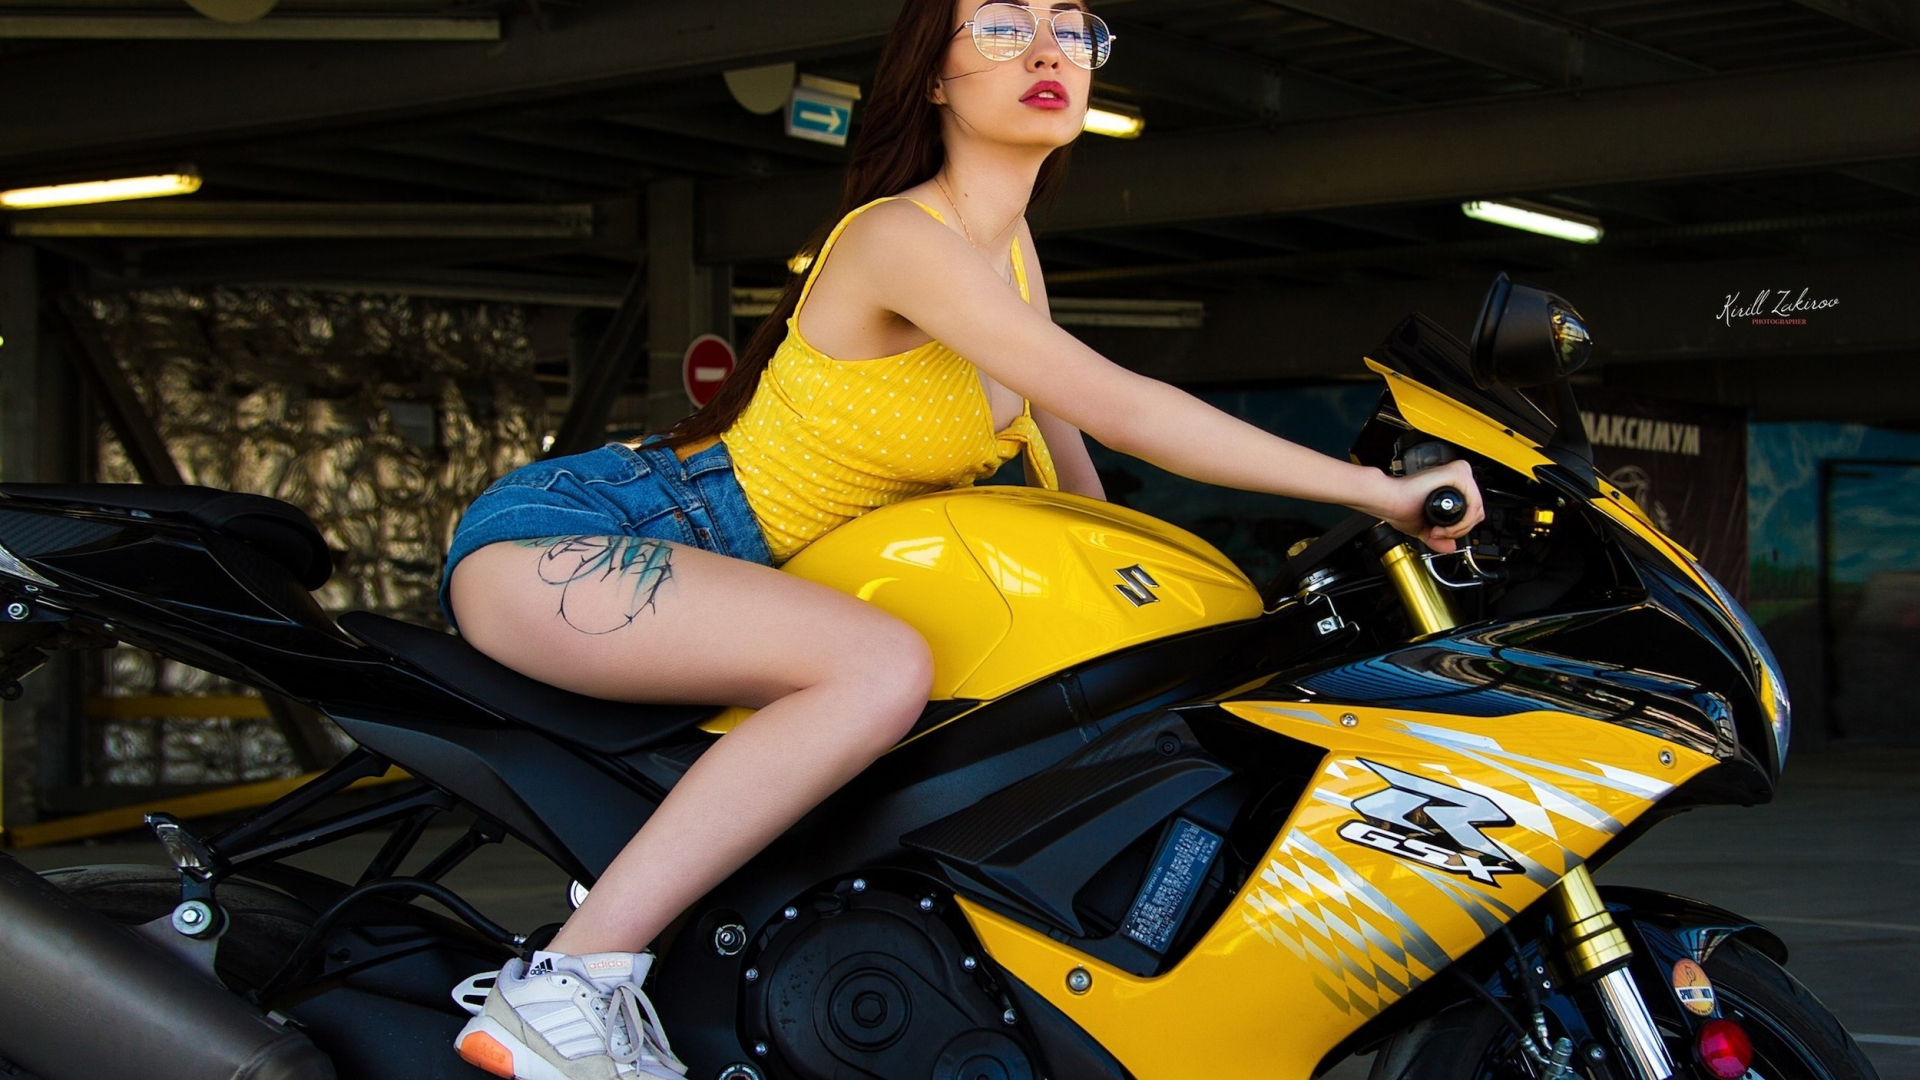 Bike and woman, sports bike, short jeans, 1920x1080 wallpaper